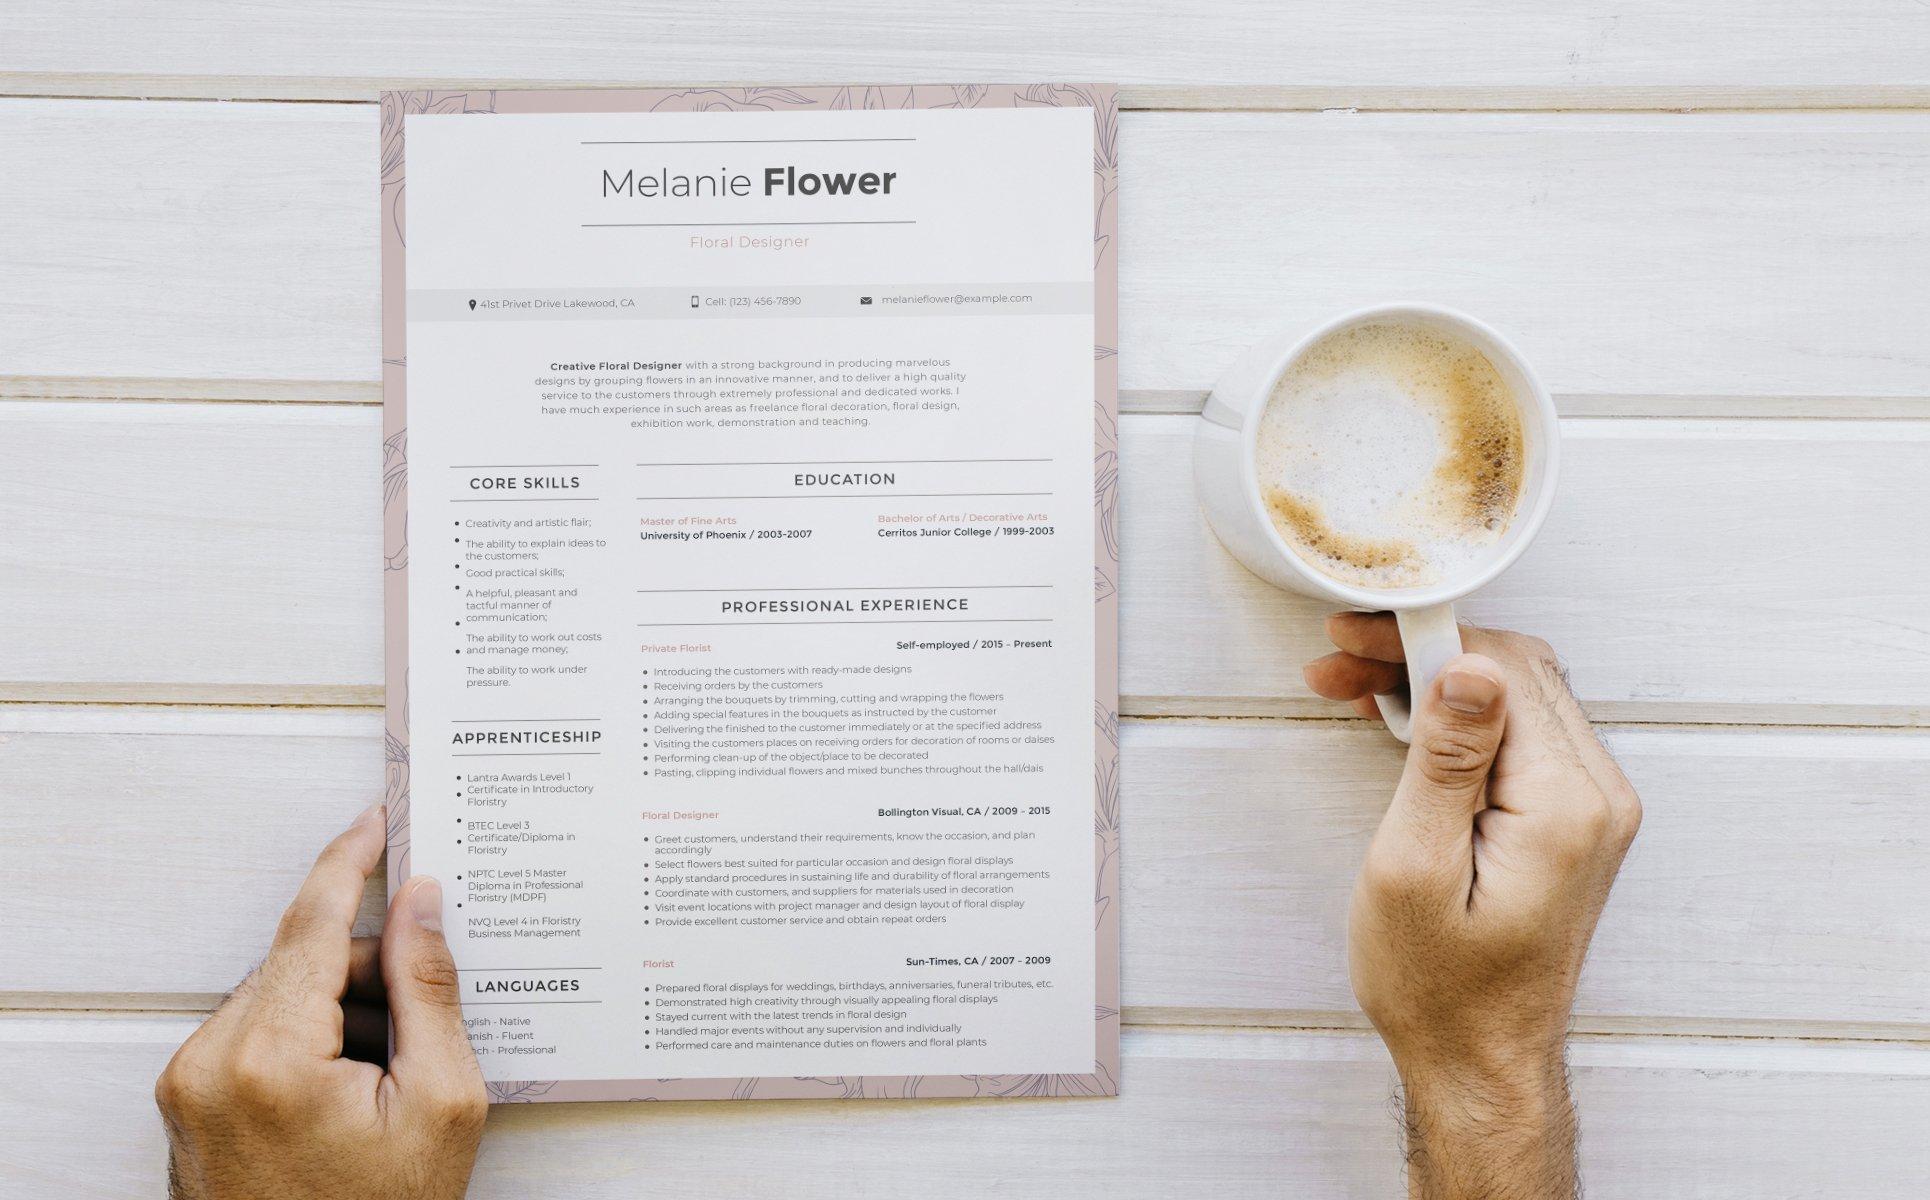 Melanie Flower Floral Designer Resume Template 65256